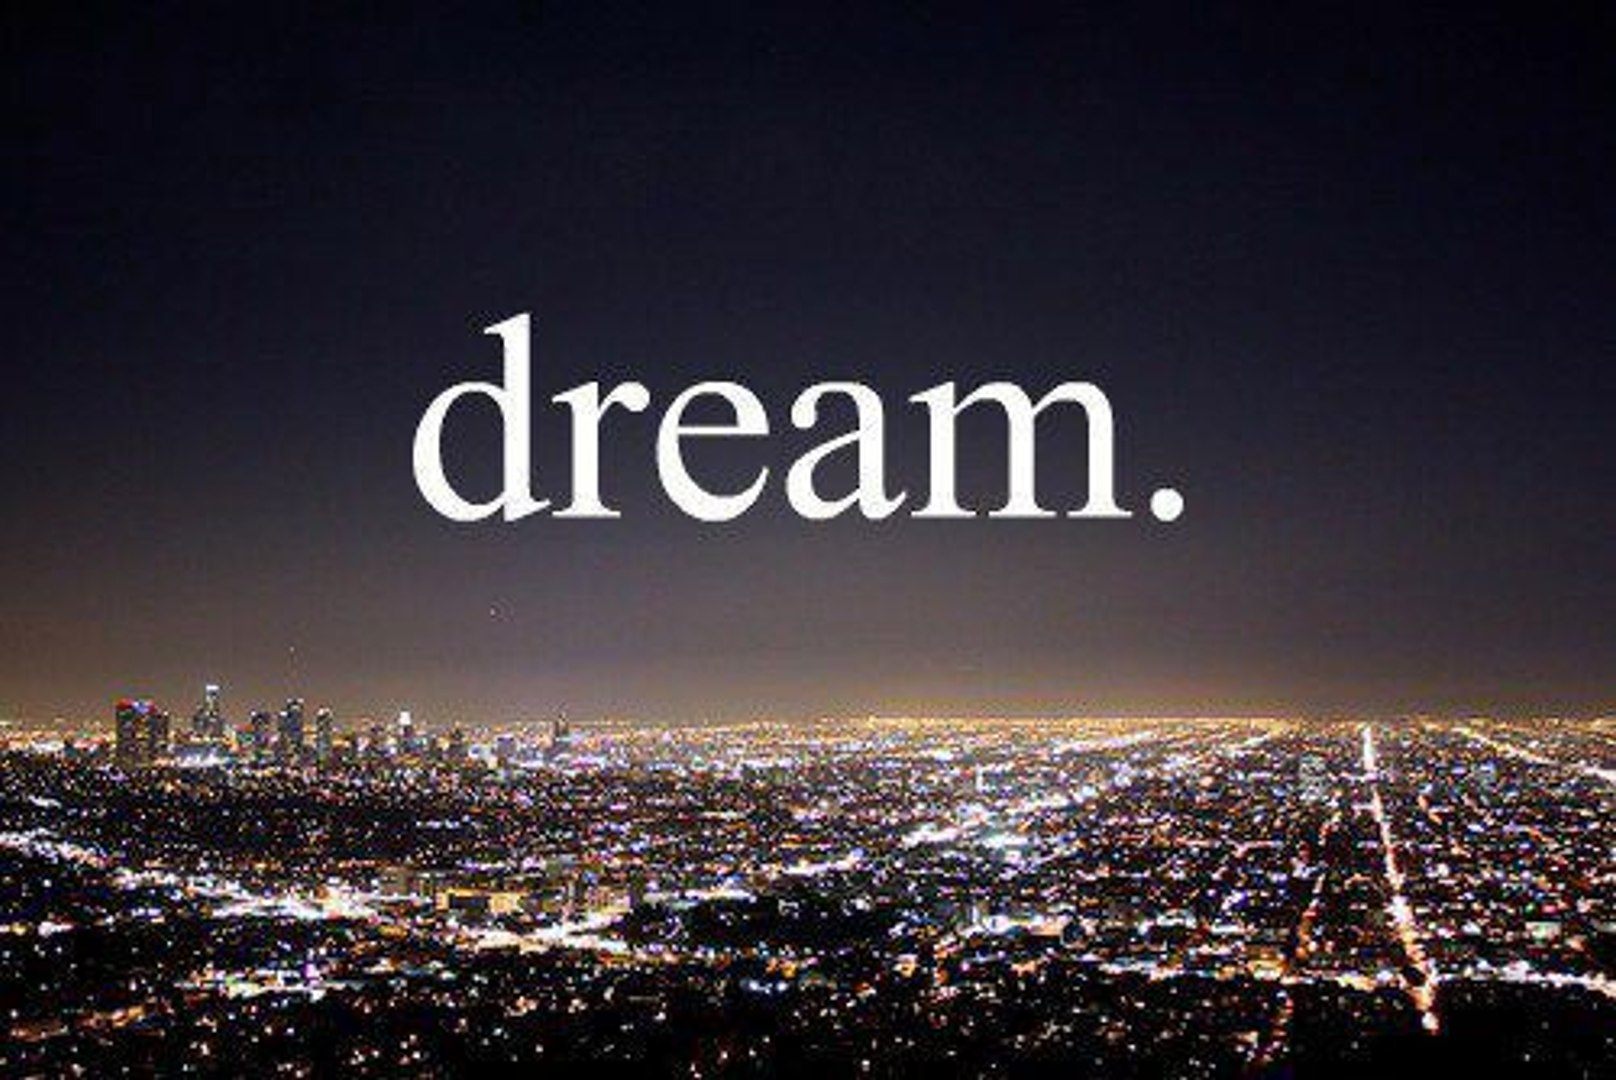 Dream - Motivational Video